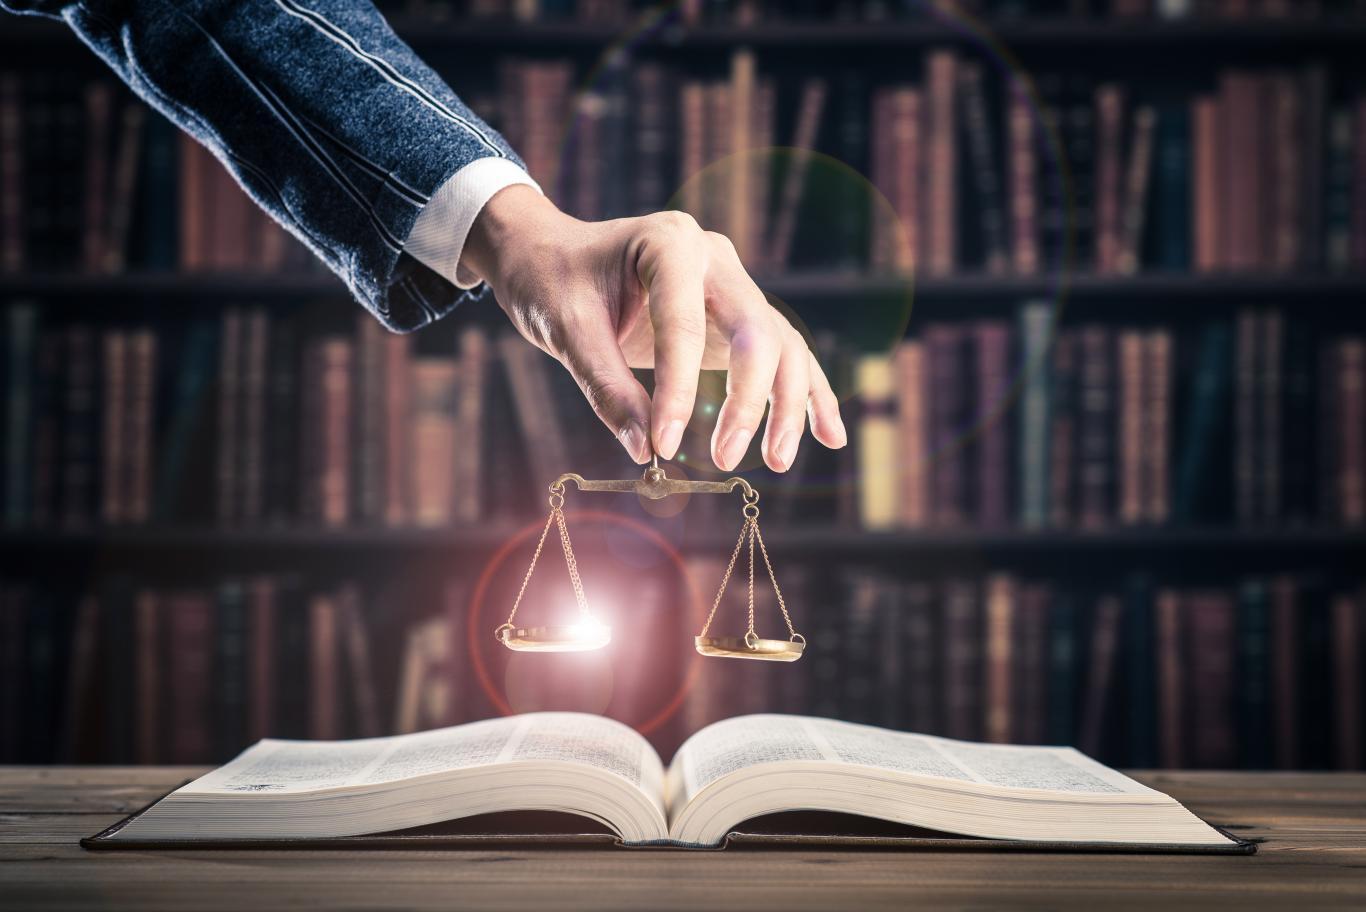 Libros de leyes, balanza